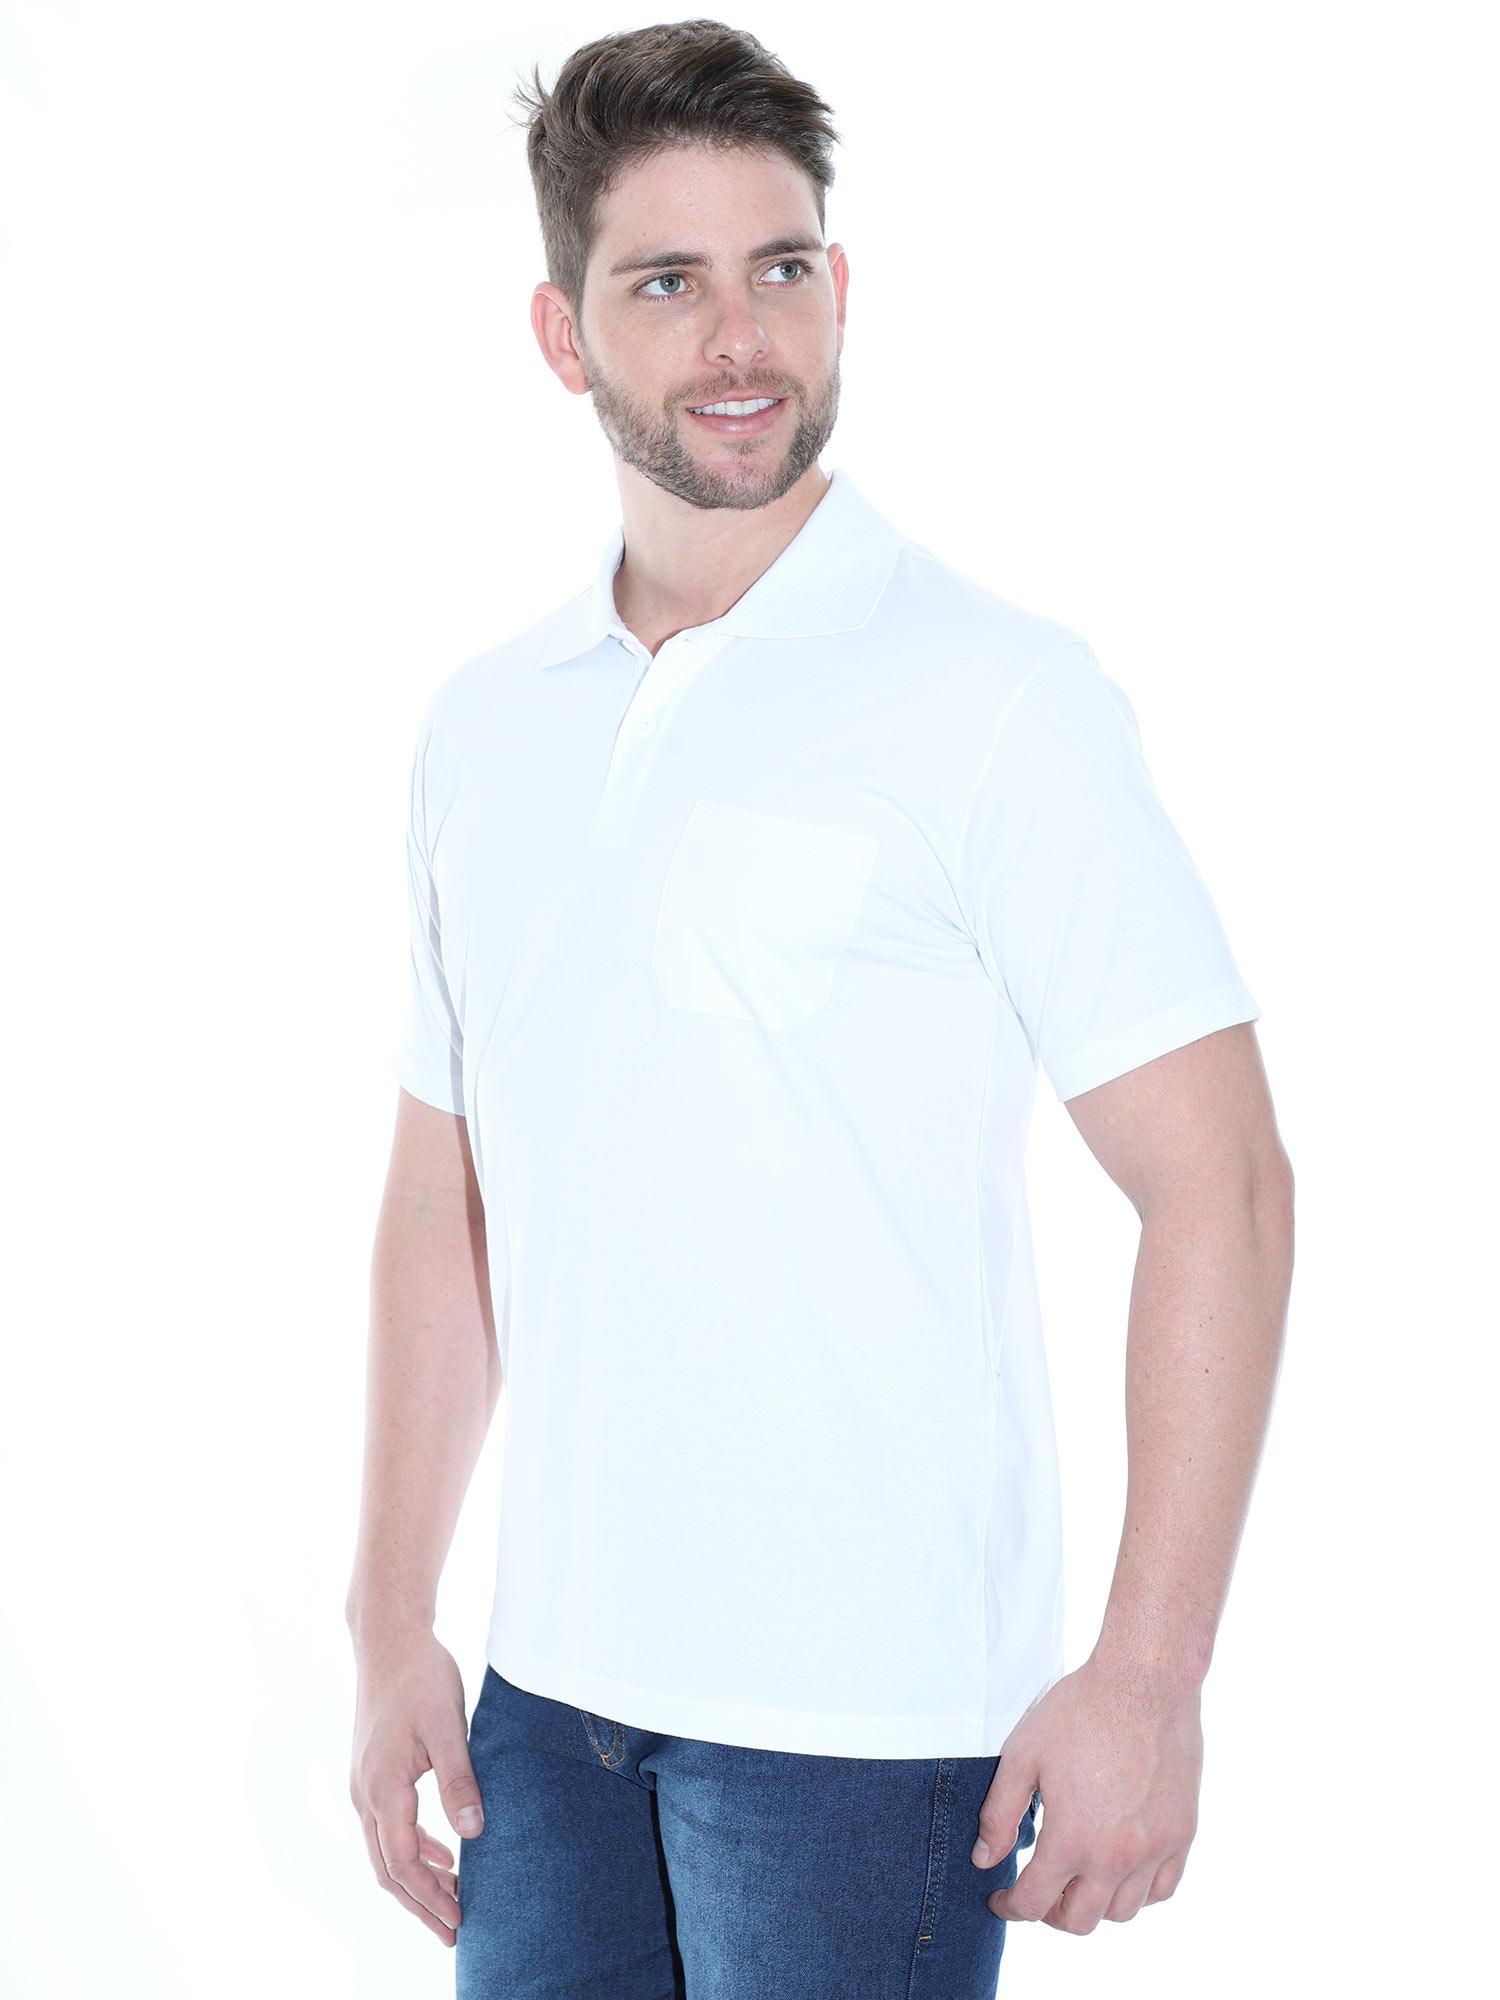 Camisa Polo Masculina com Bolso Básica Algodão Lisa Branco